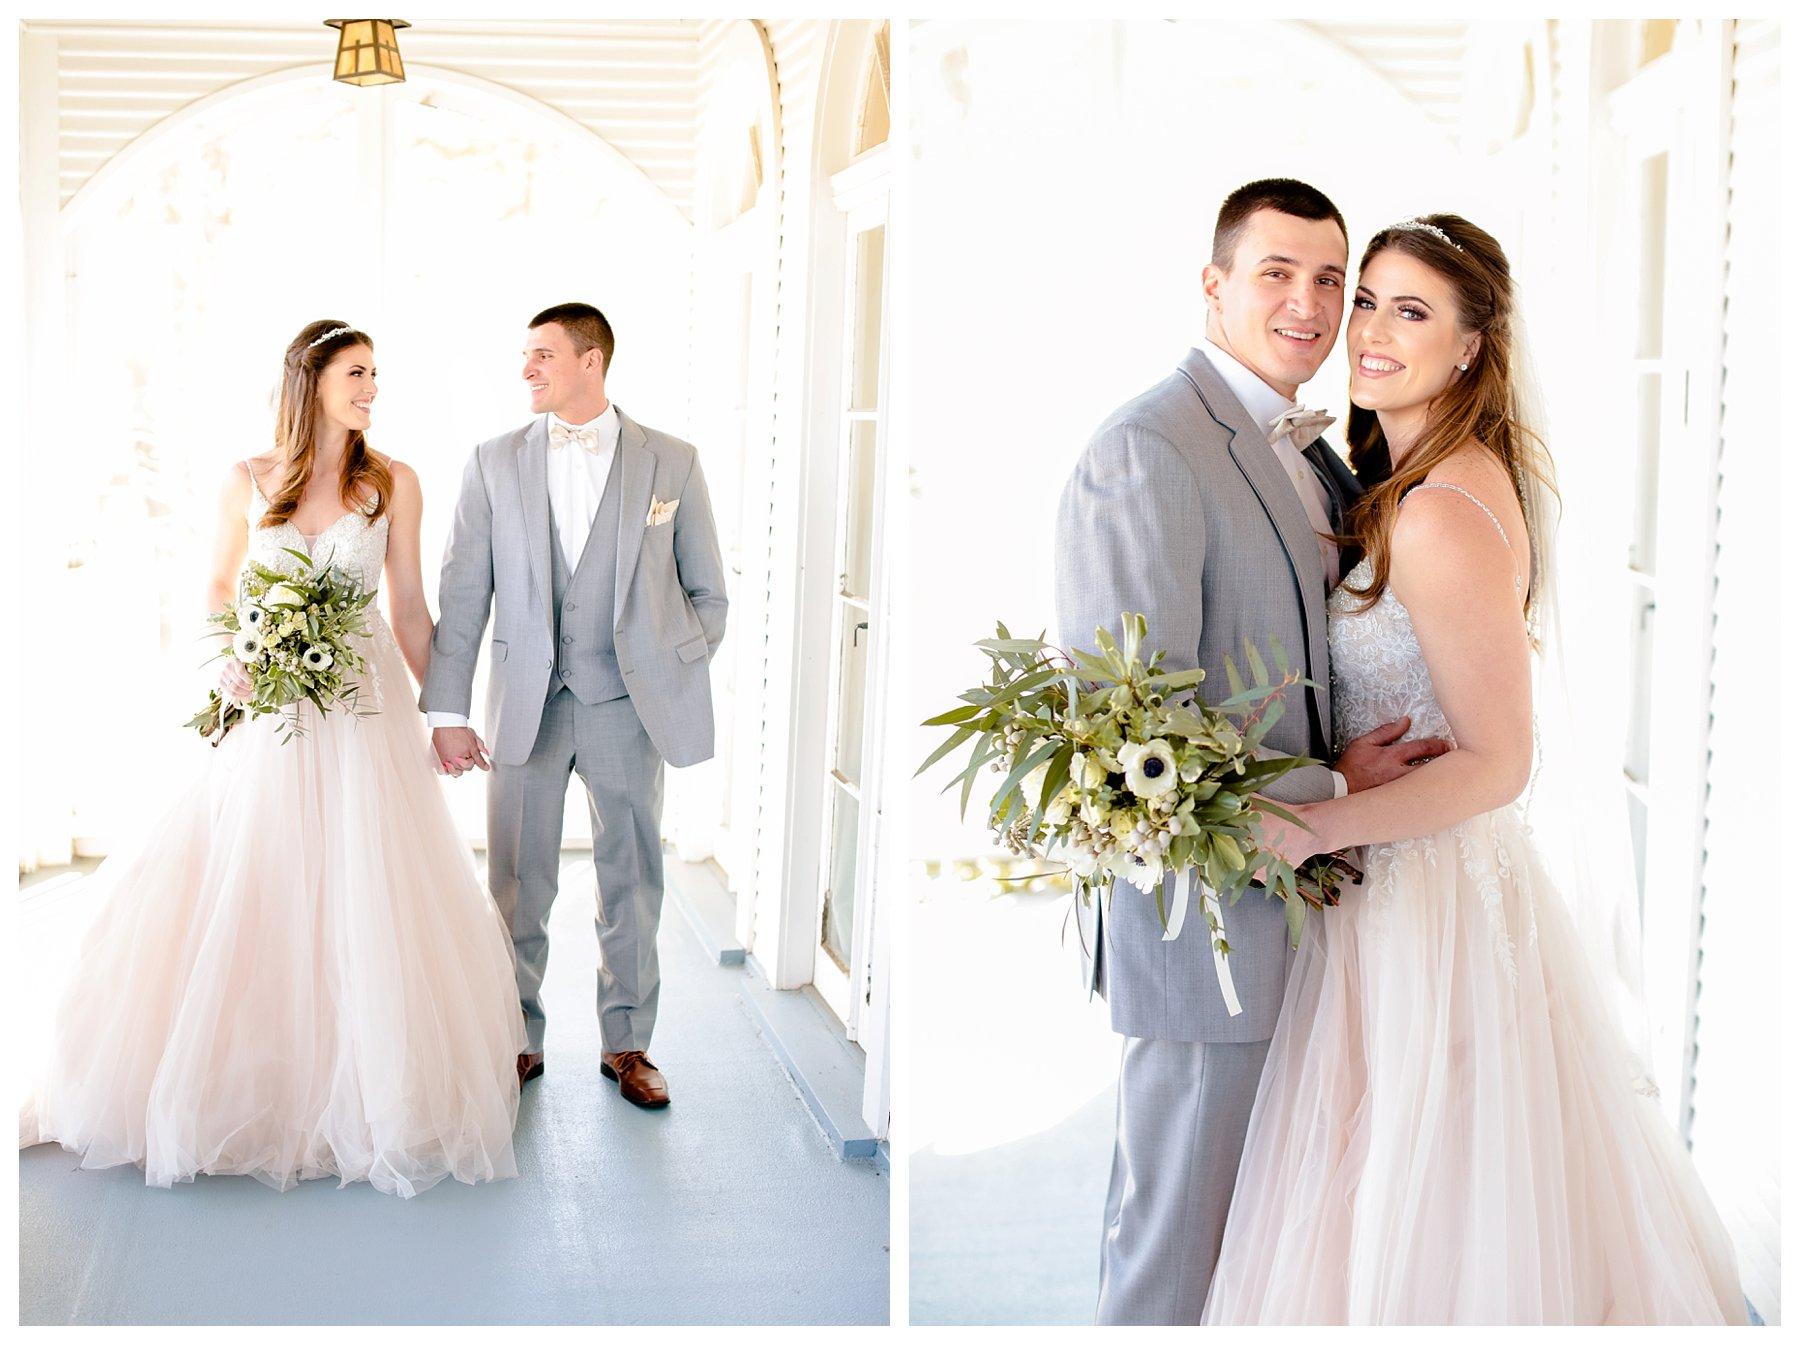 photographer_wedding_saint_louis_Kansas_City_Photography_Videography_workshop_training_styled_engagement_Lake_Ozark_KC_MO_STL_Rolla_Hermann_Saint_James_0400.jpg